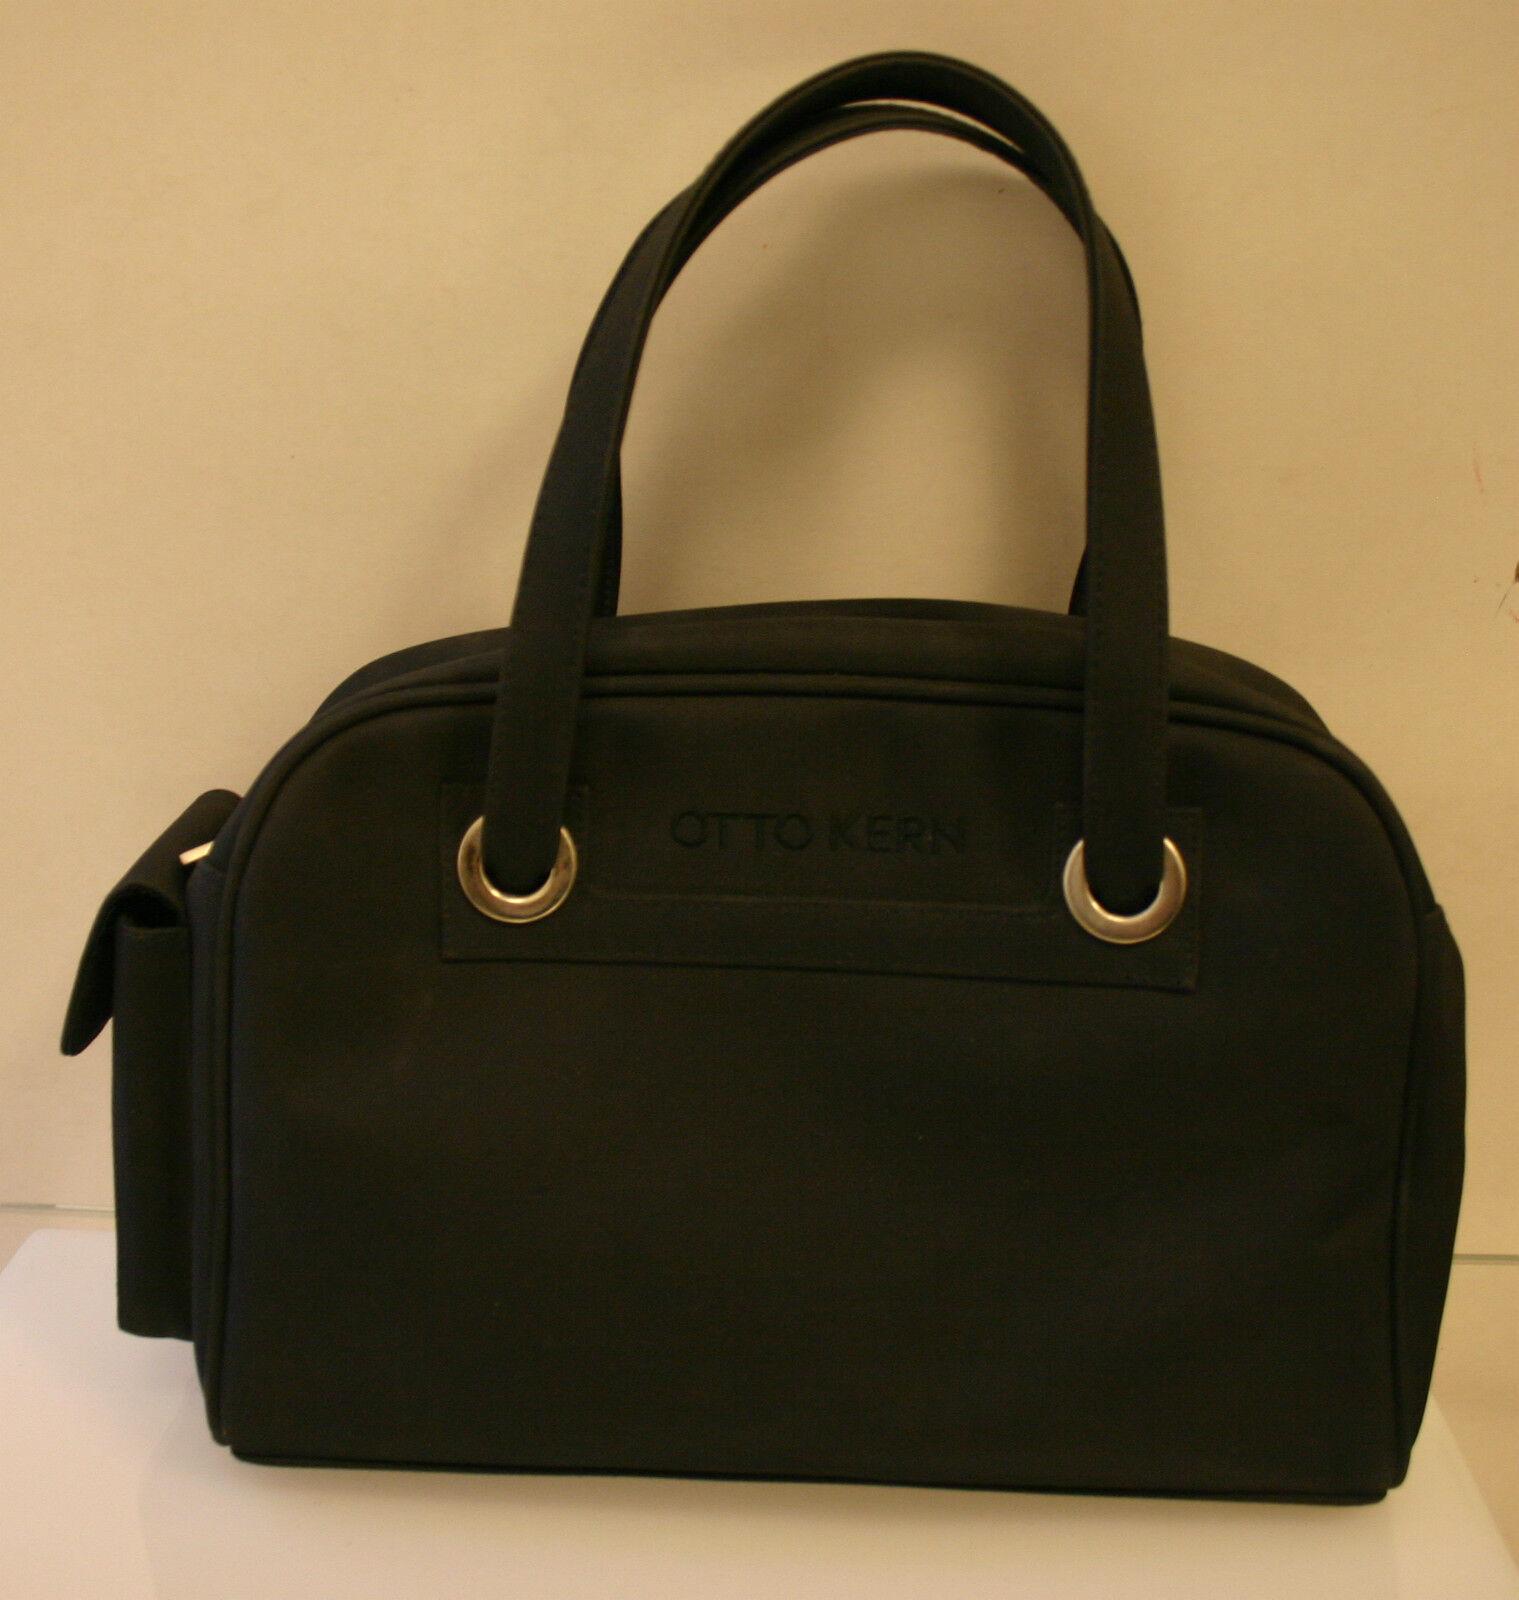 otto kern tasche gro e handtasche shopper nylon schwarz 100 original eur 35 00 picclick de. Black Bedroom Furniture Sets. Home Design Ideas